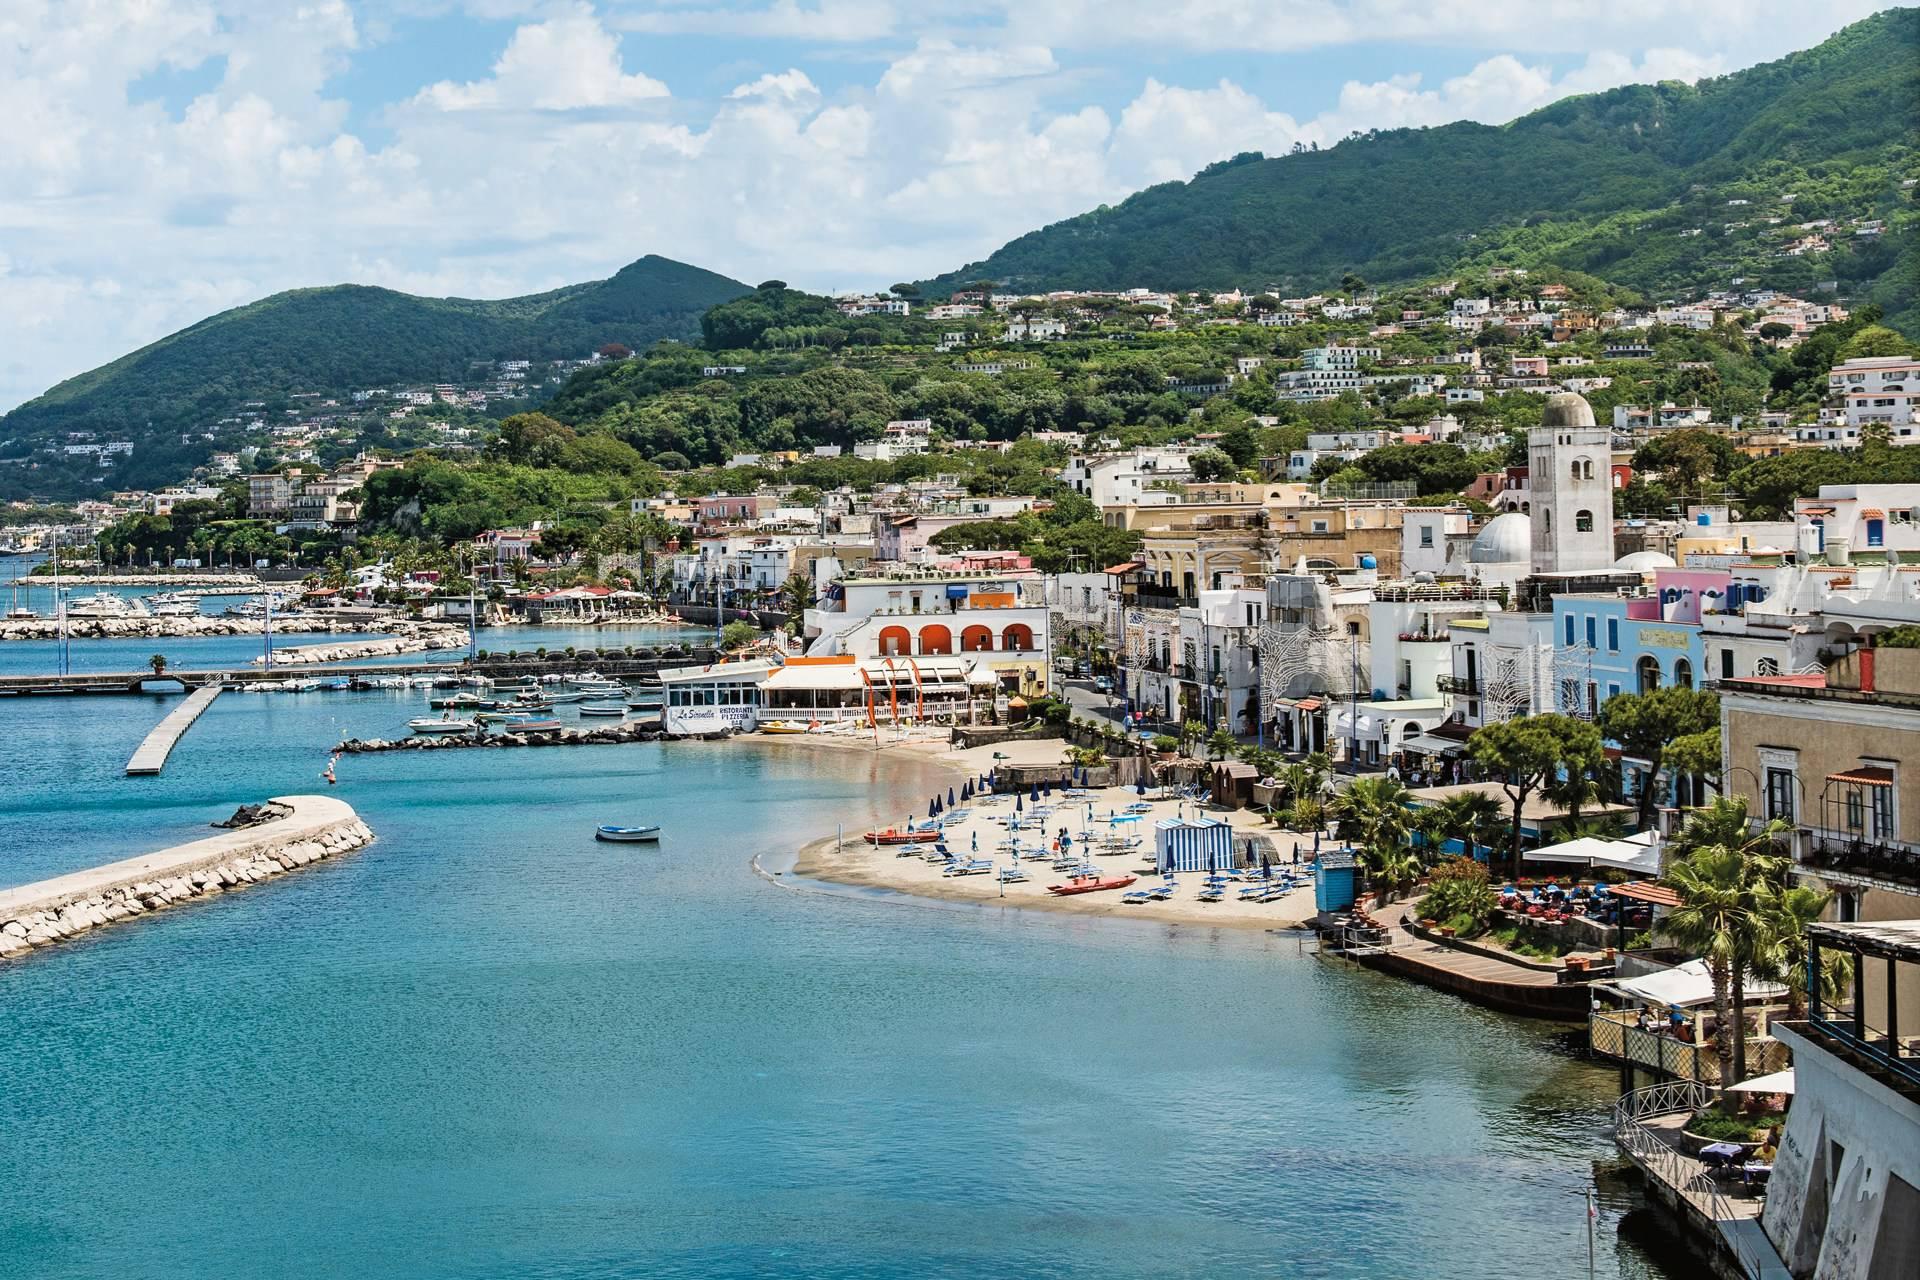 Terremoto ad Ischia, panico tra i residenti